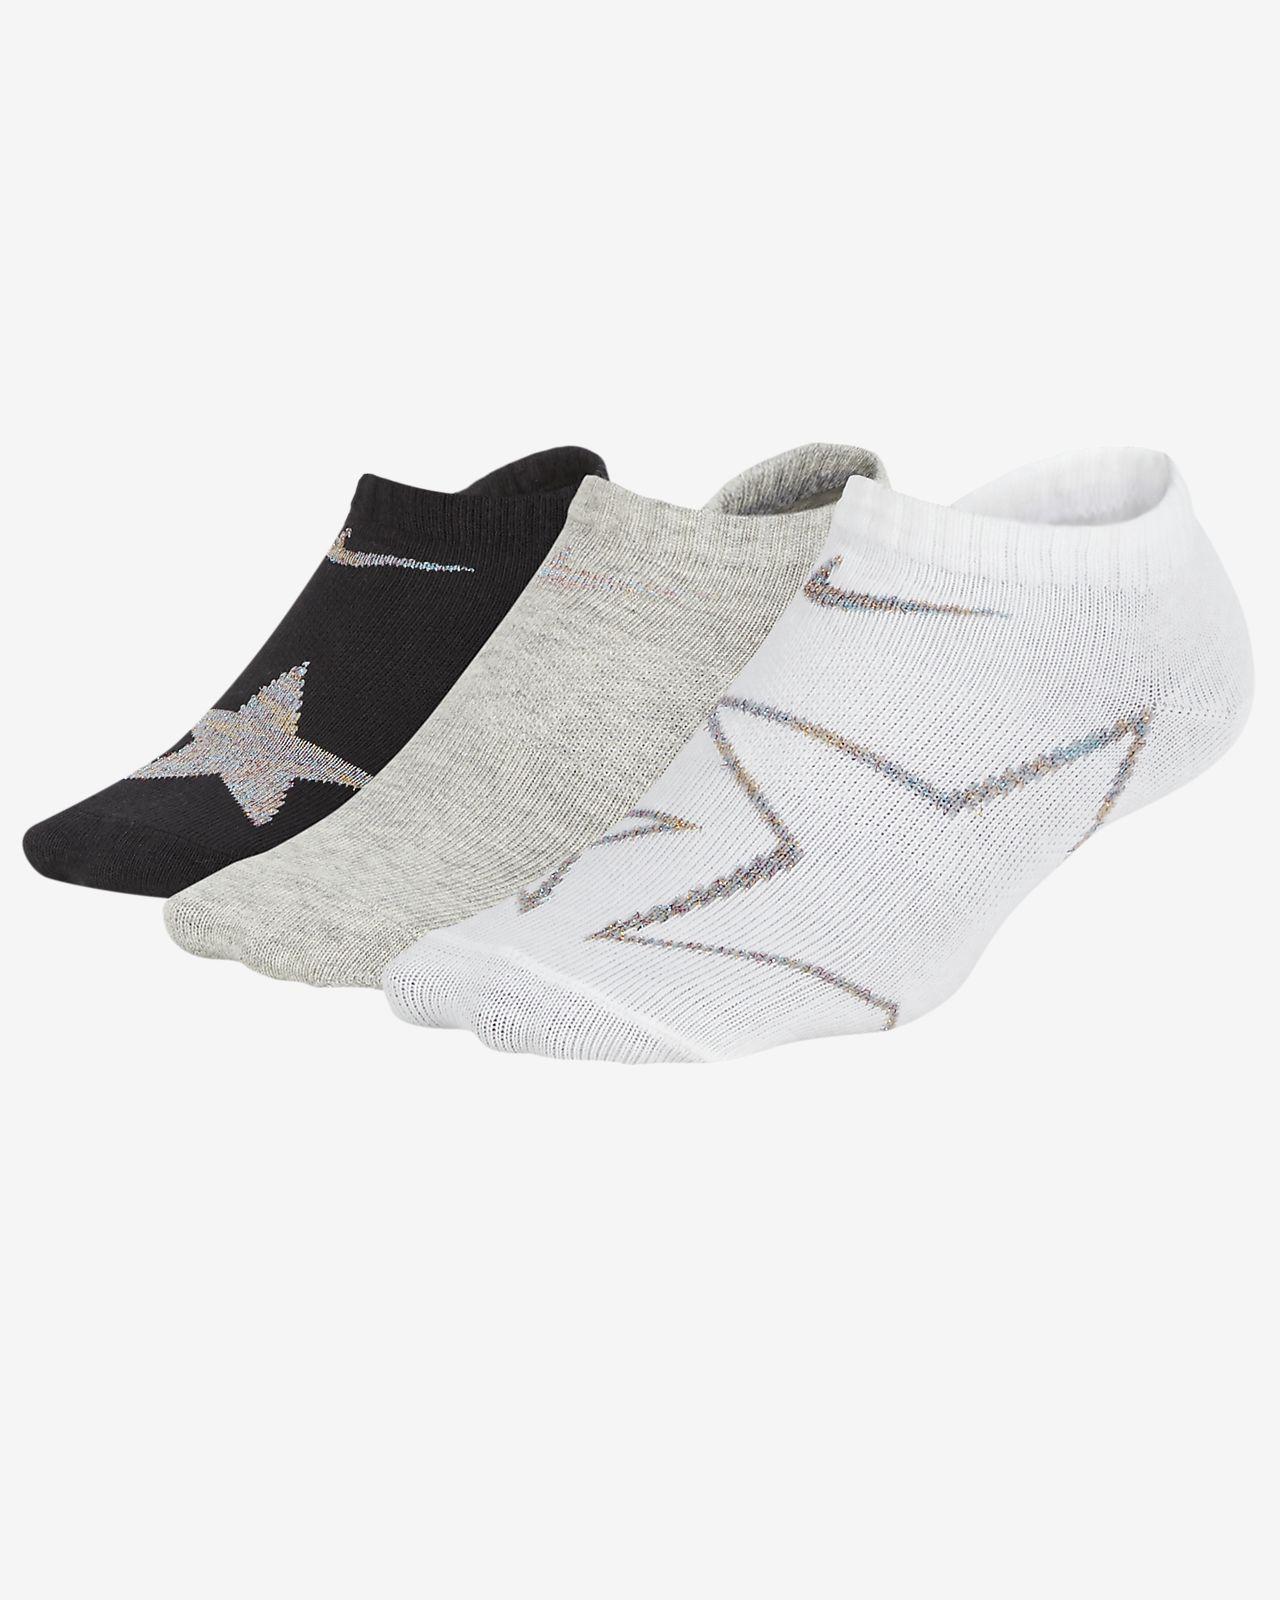 Nike Little Kids' Lightweight Graphic Socks (3 Pairs)